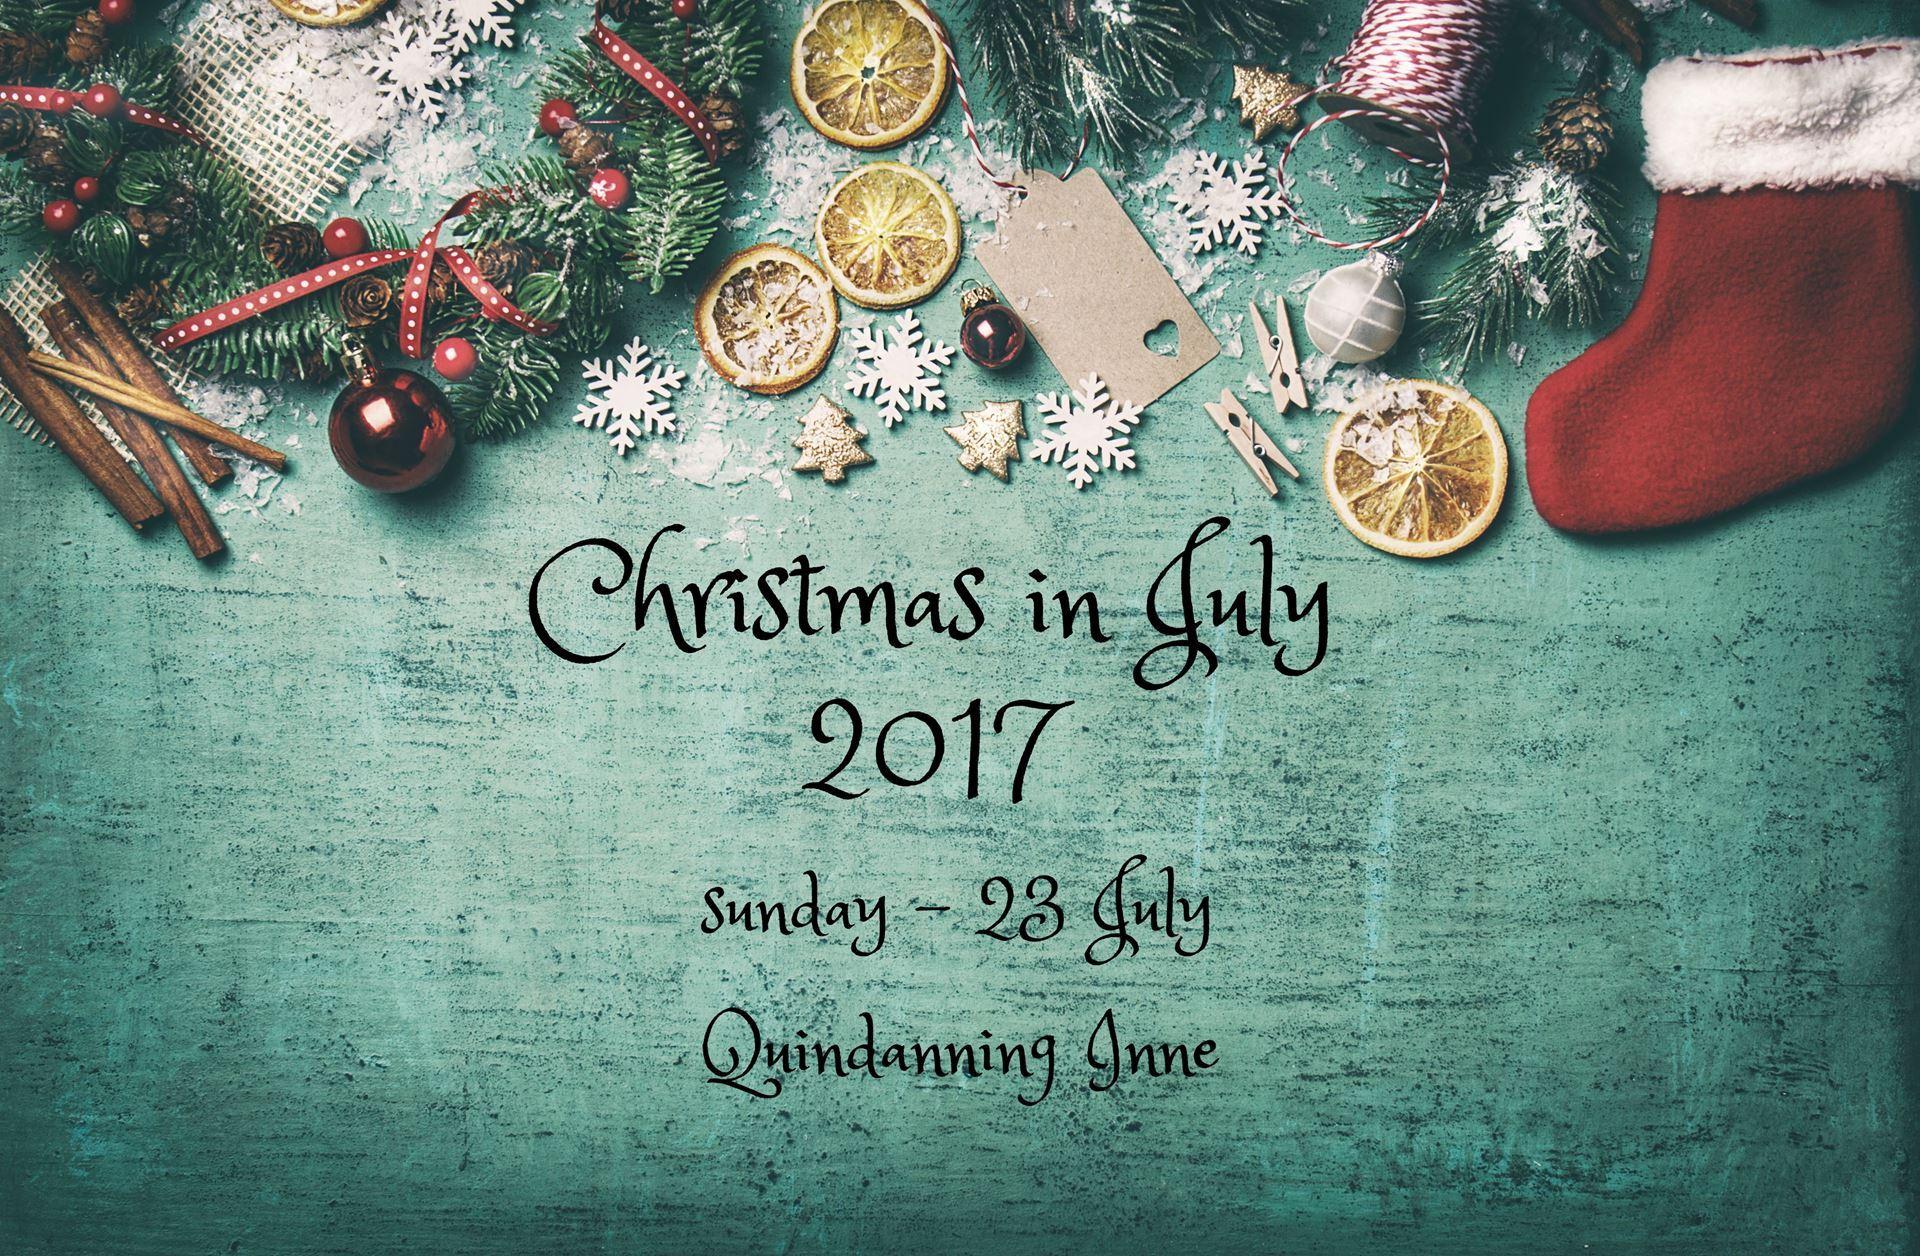 porsche club of western australia christmas in july at quindanning - Christmas In July Australia